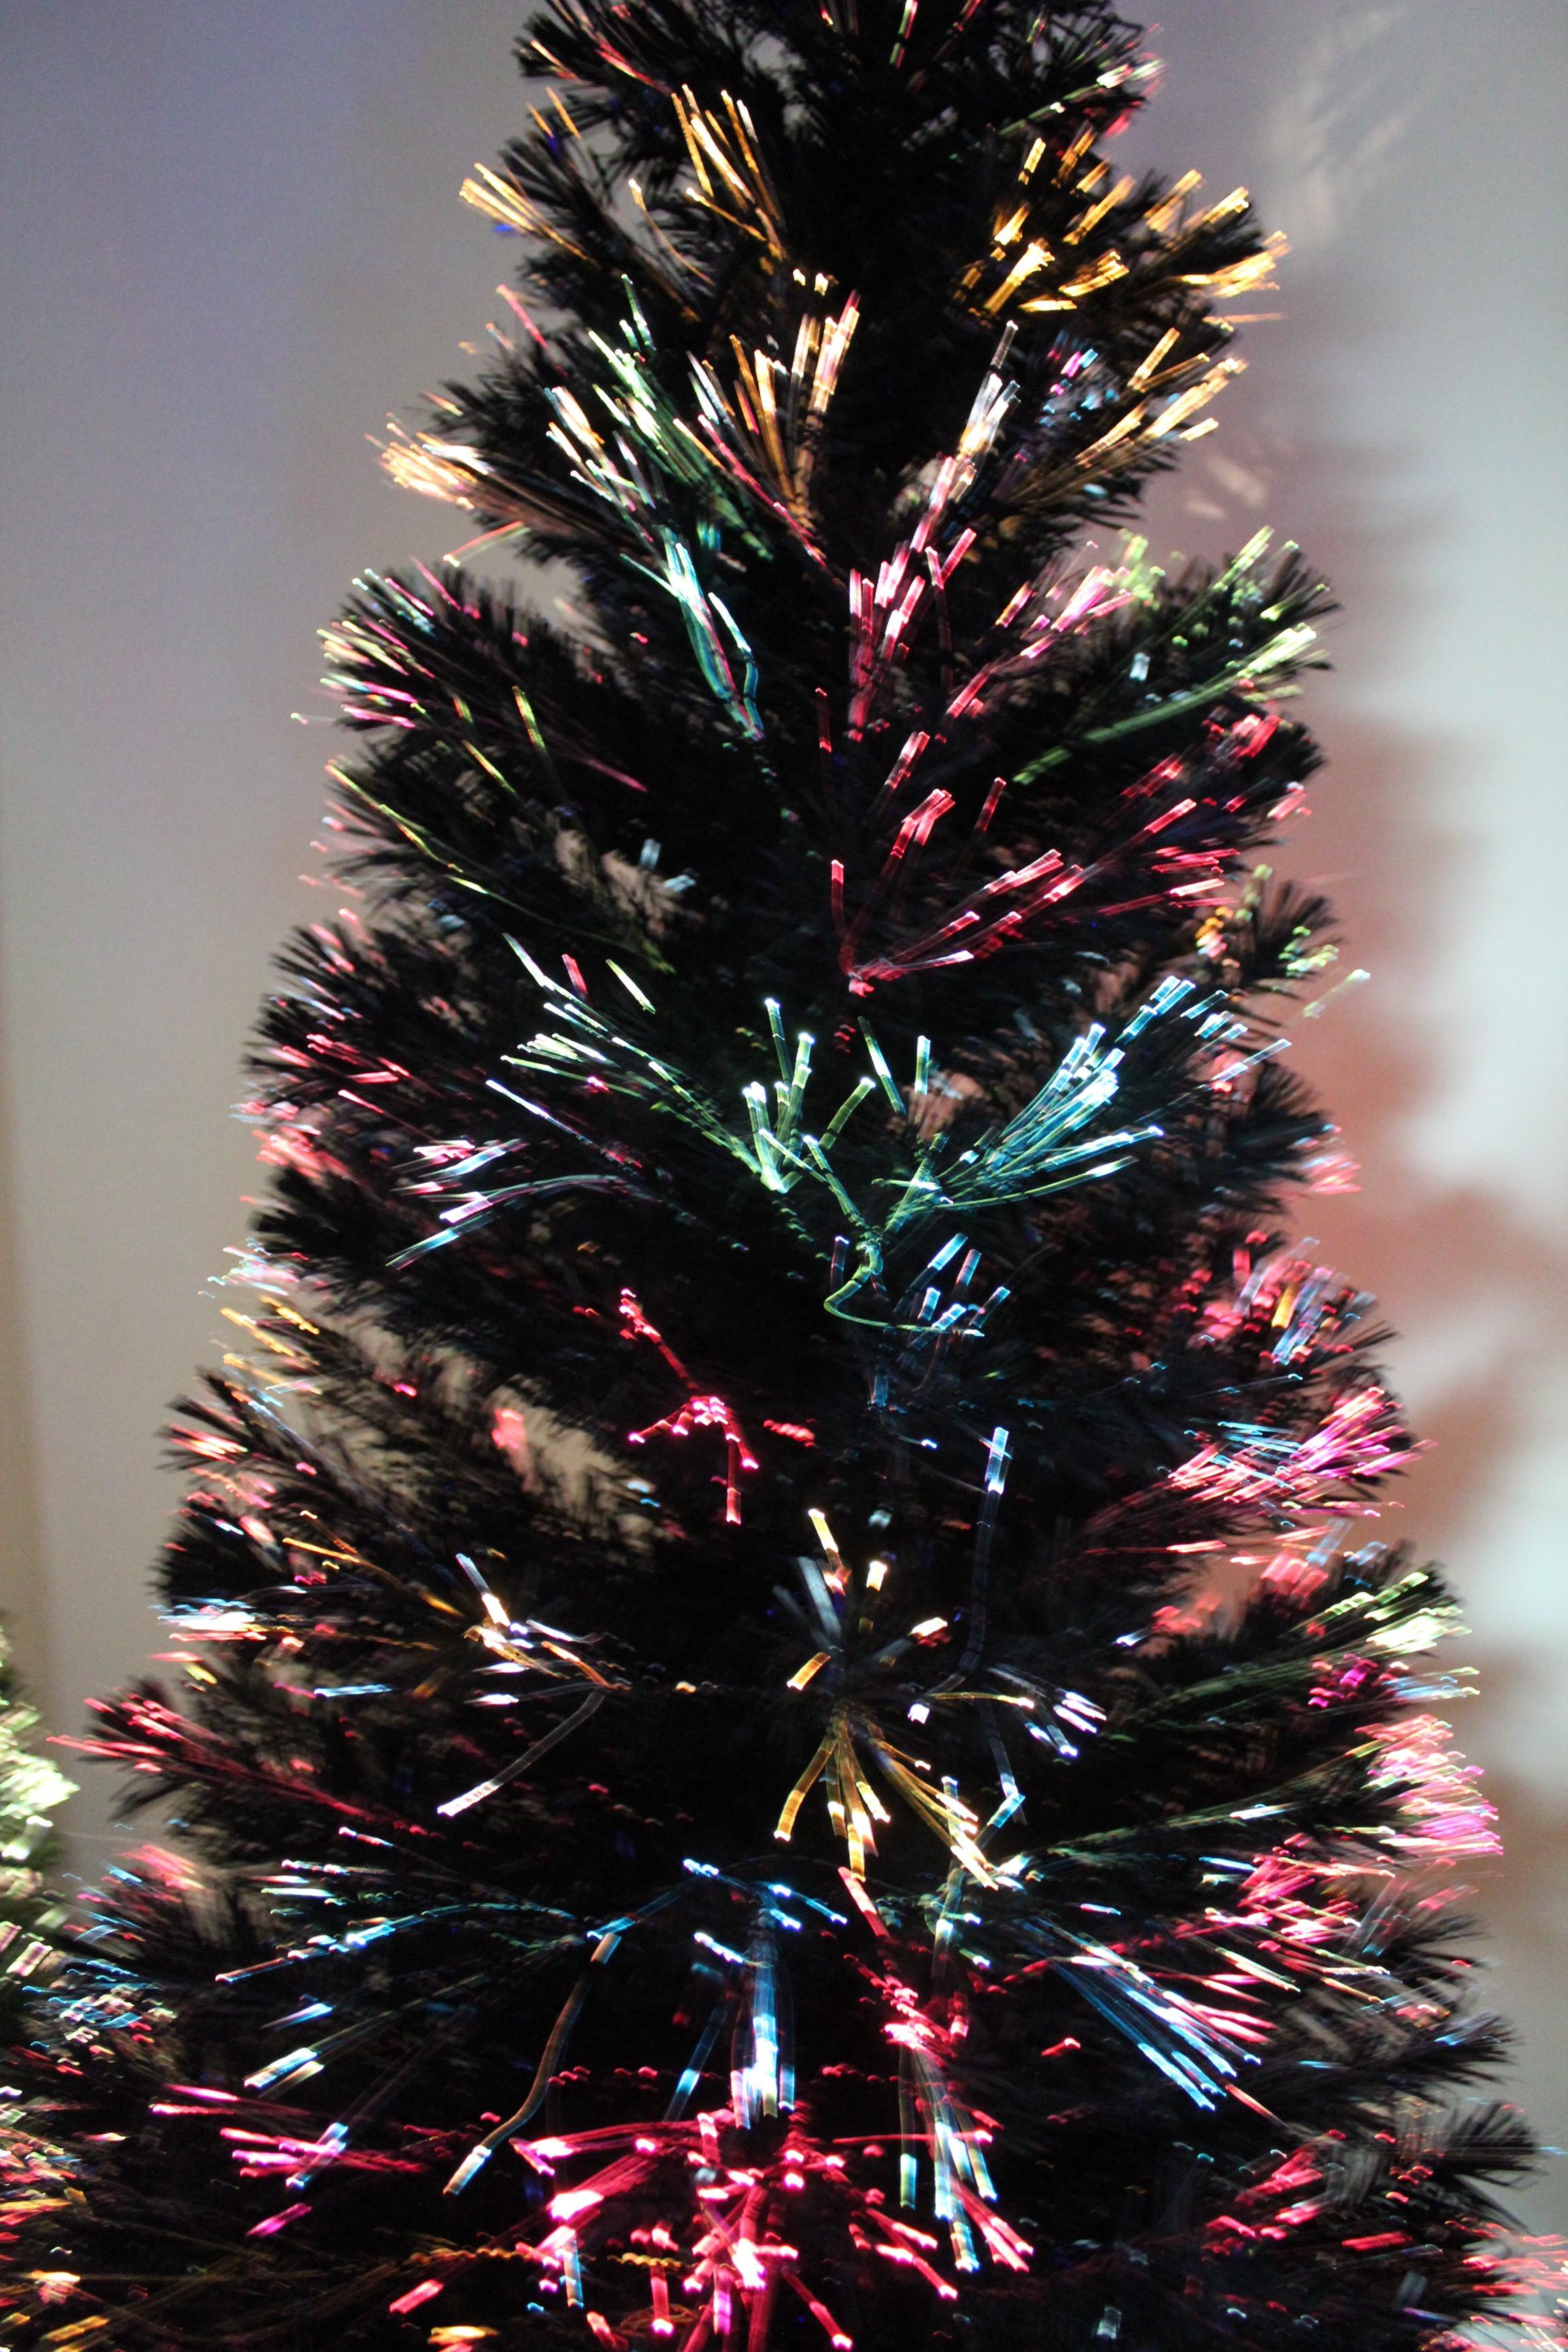 Fiber Optic Christmas Lighting  Fiber Optic Christmas Tree 7Ft